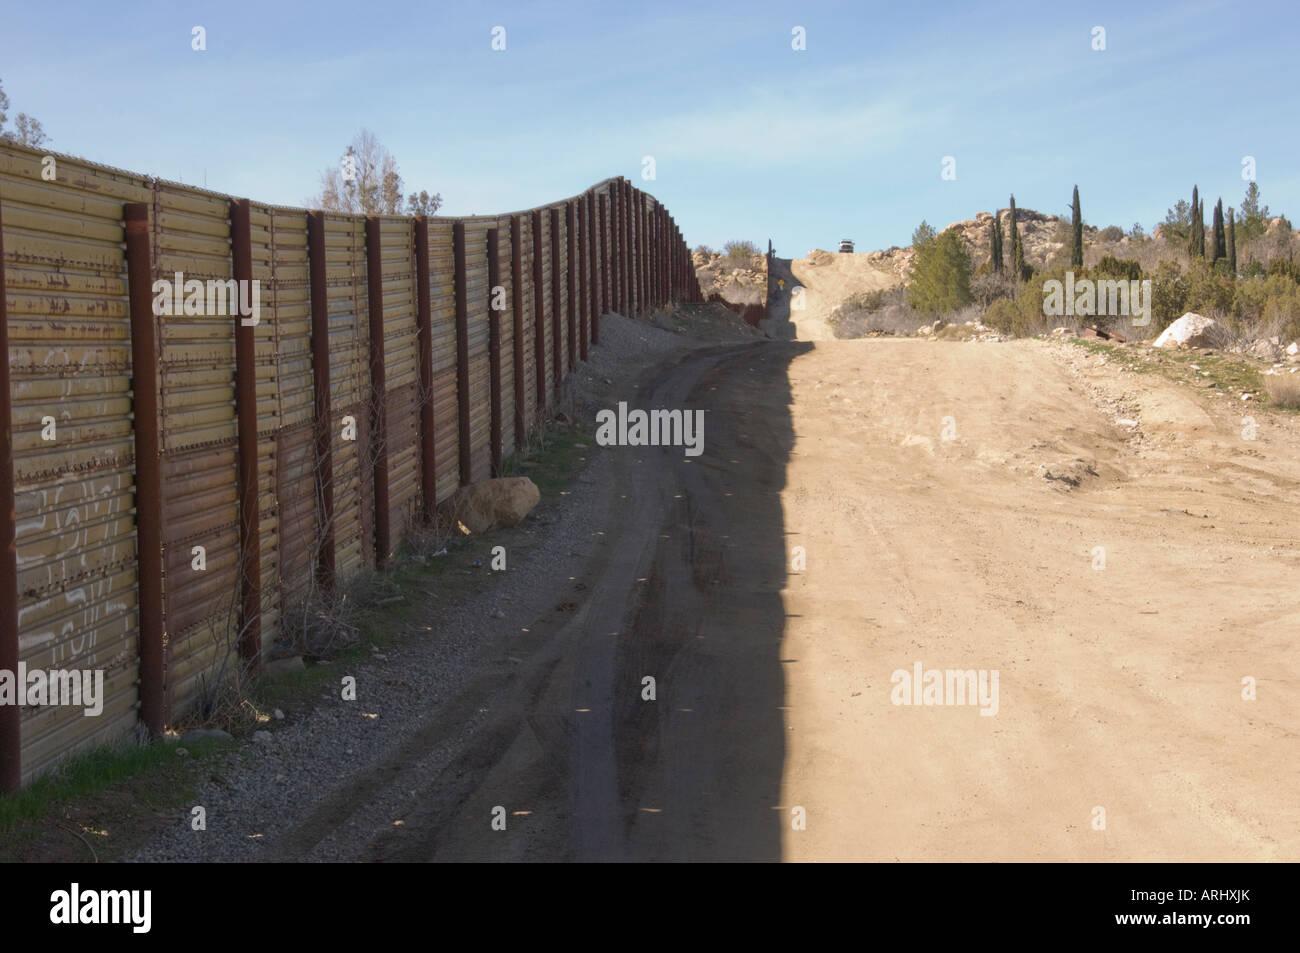 Mexico Border Fence at Jacumba, California - Stock Image